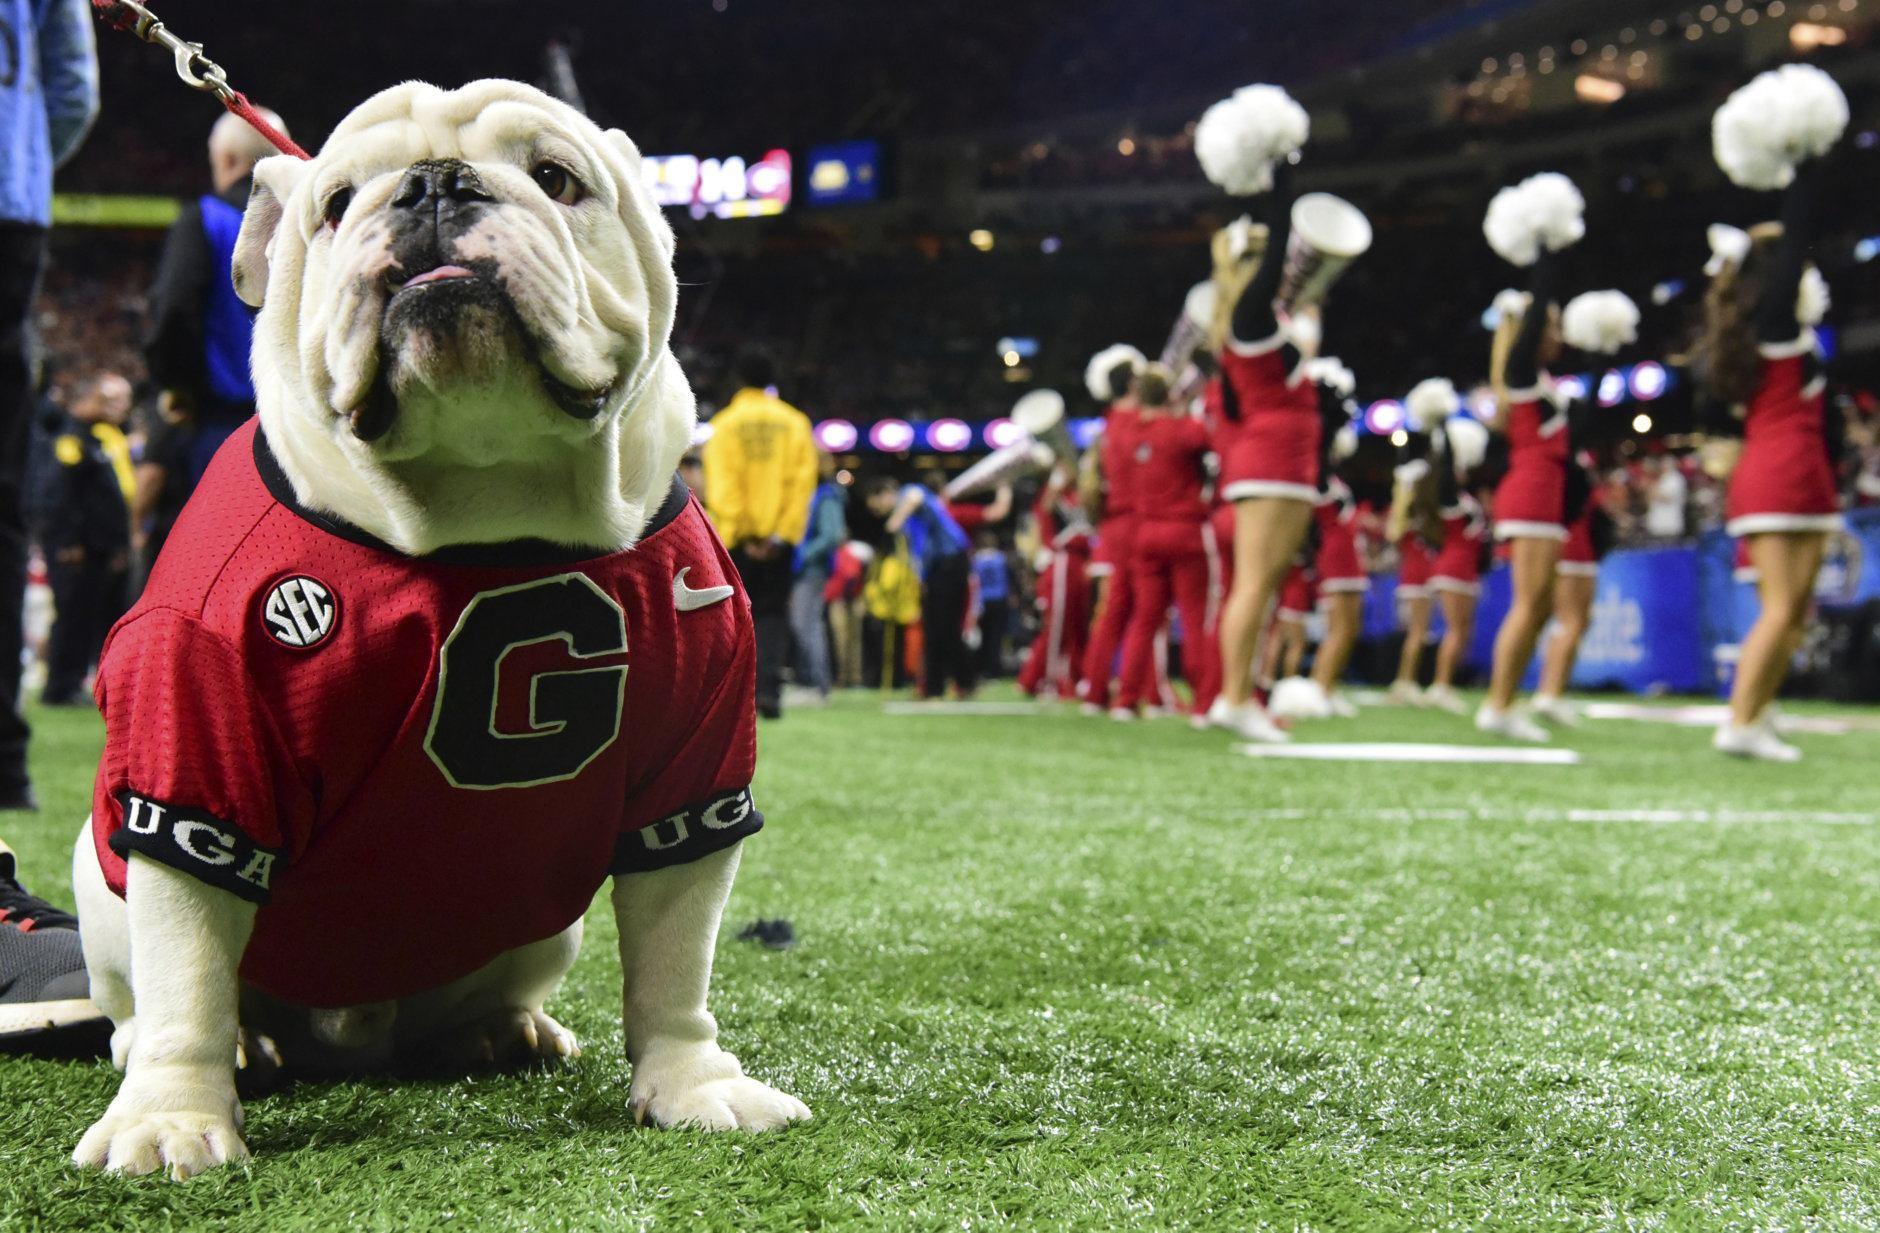 <p>1. Uga the bulldog, University of Georgia</p>